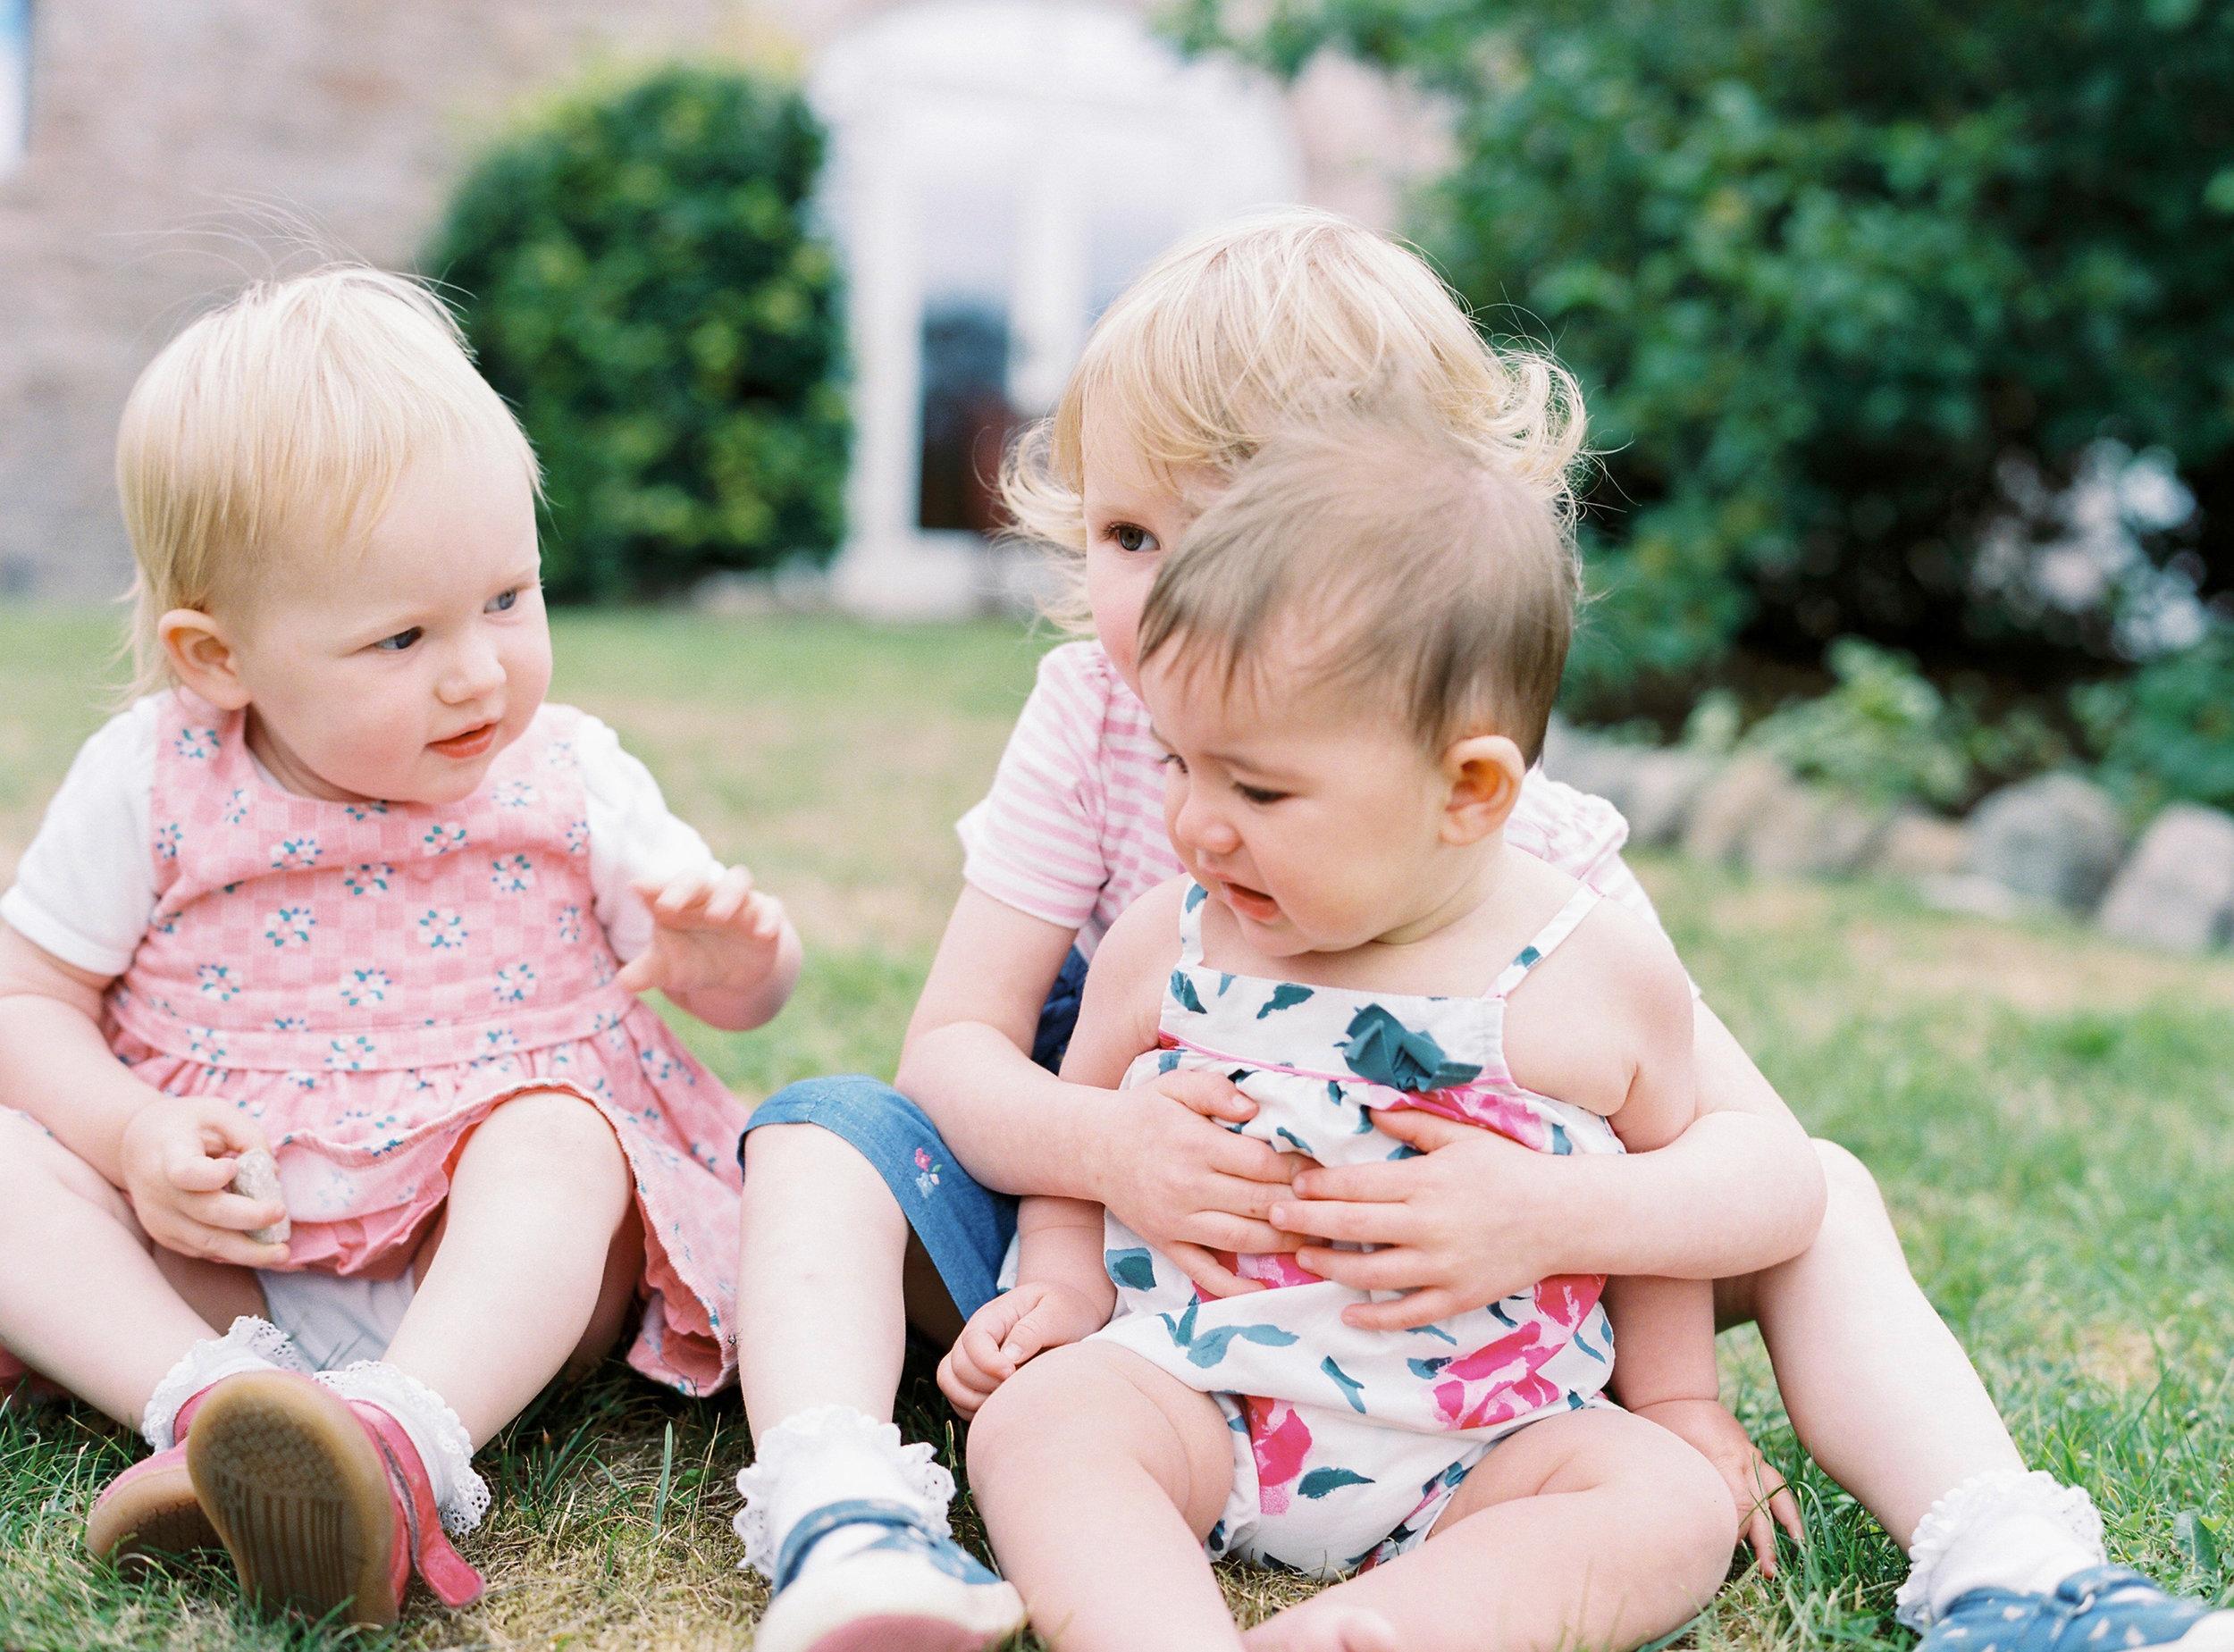 cumbria_family_photographer (187).jpg